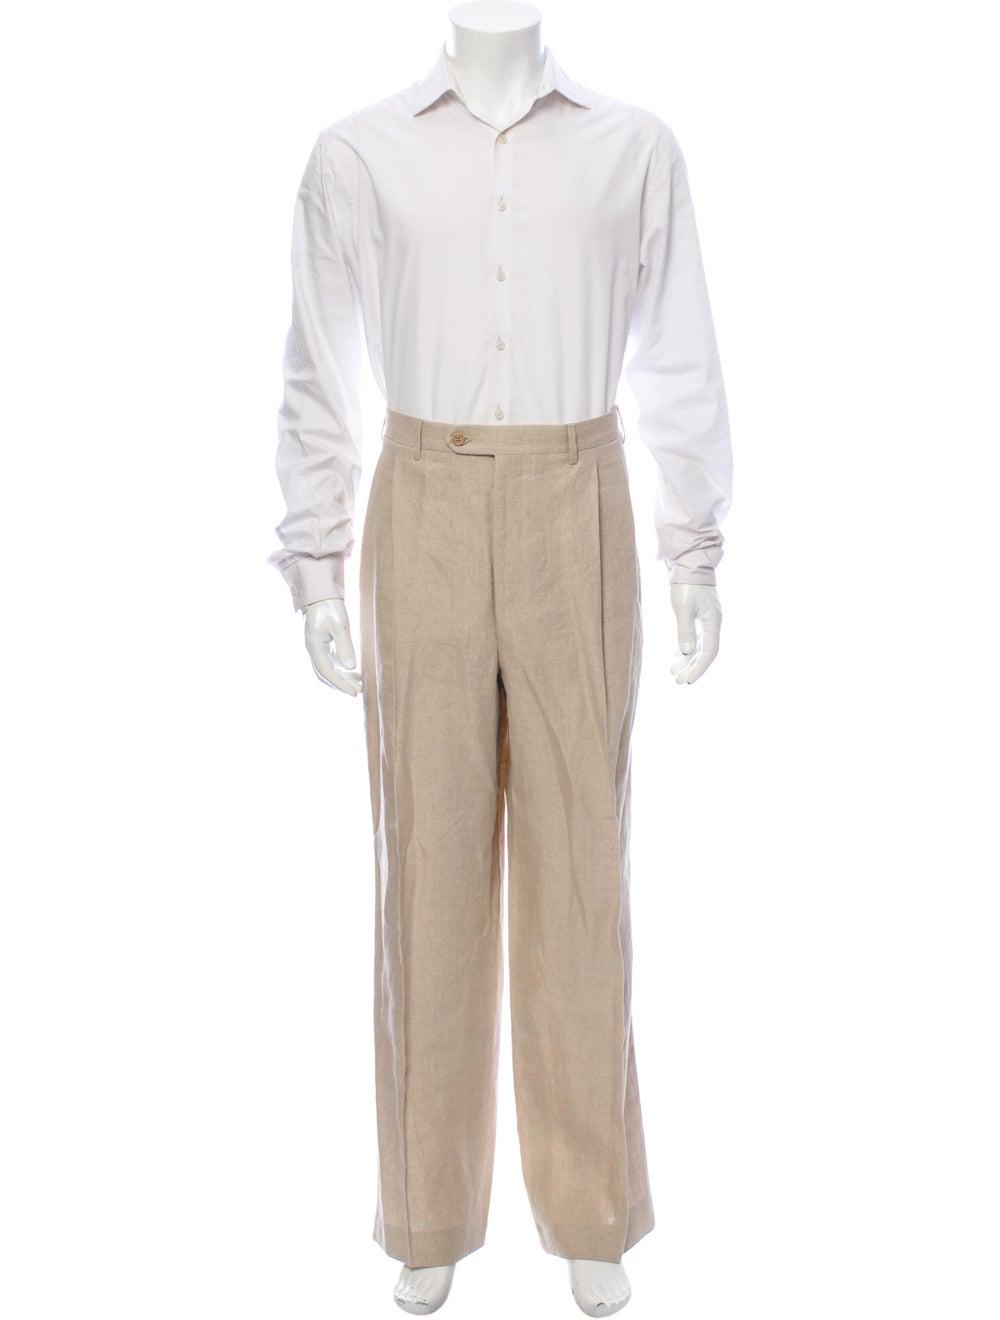 Canali Linen Two-Piece Suit - image 4